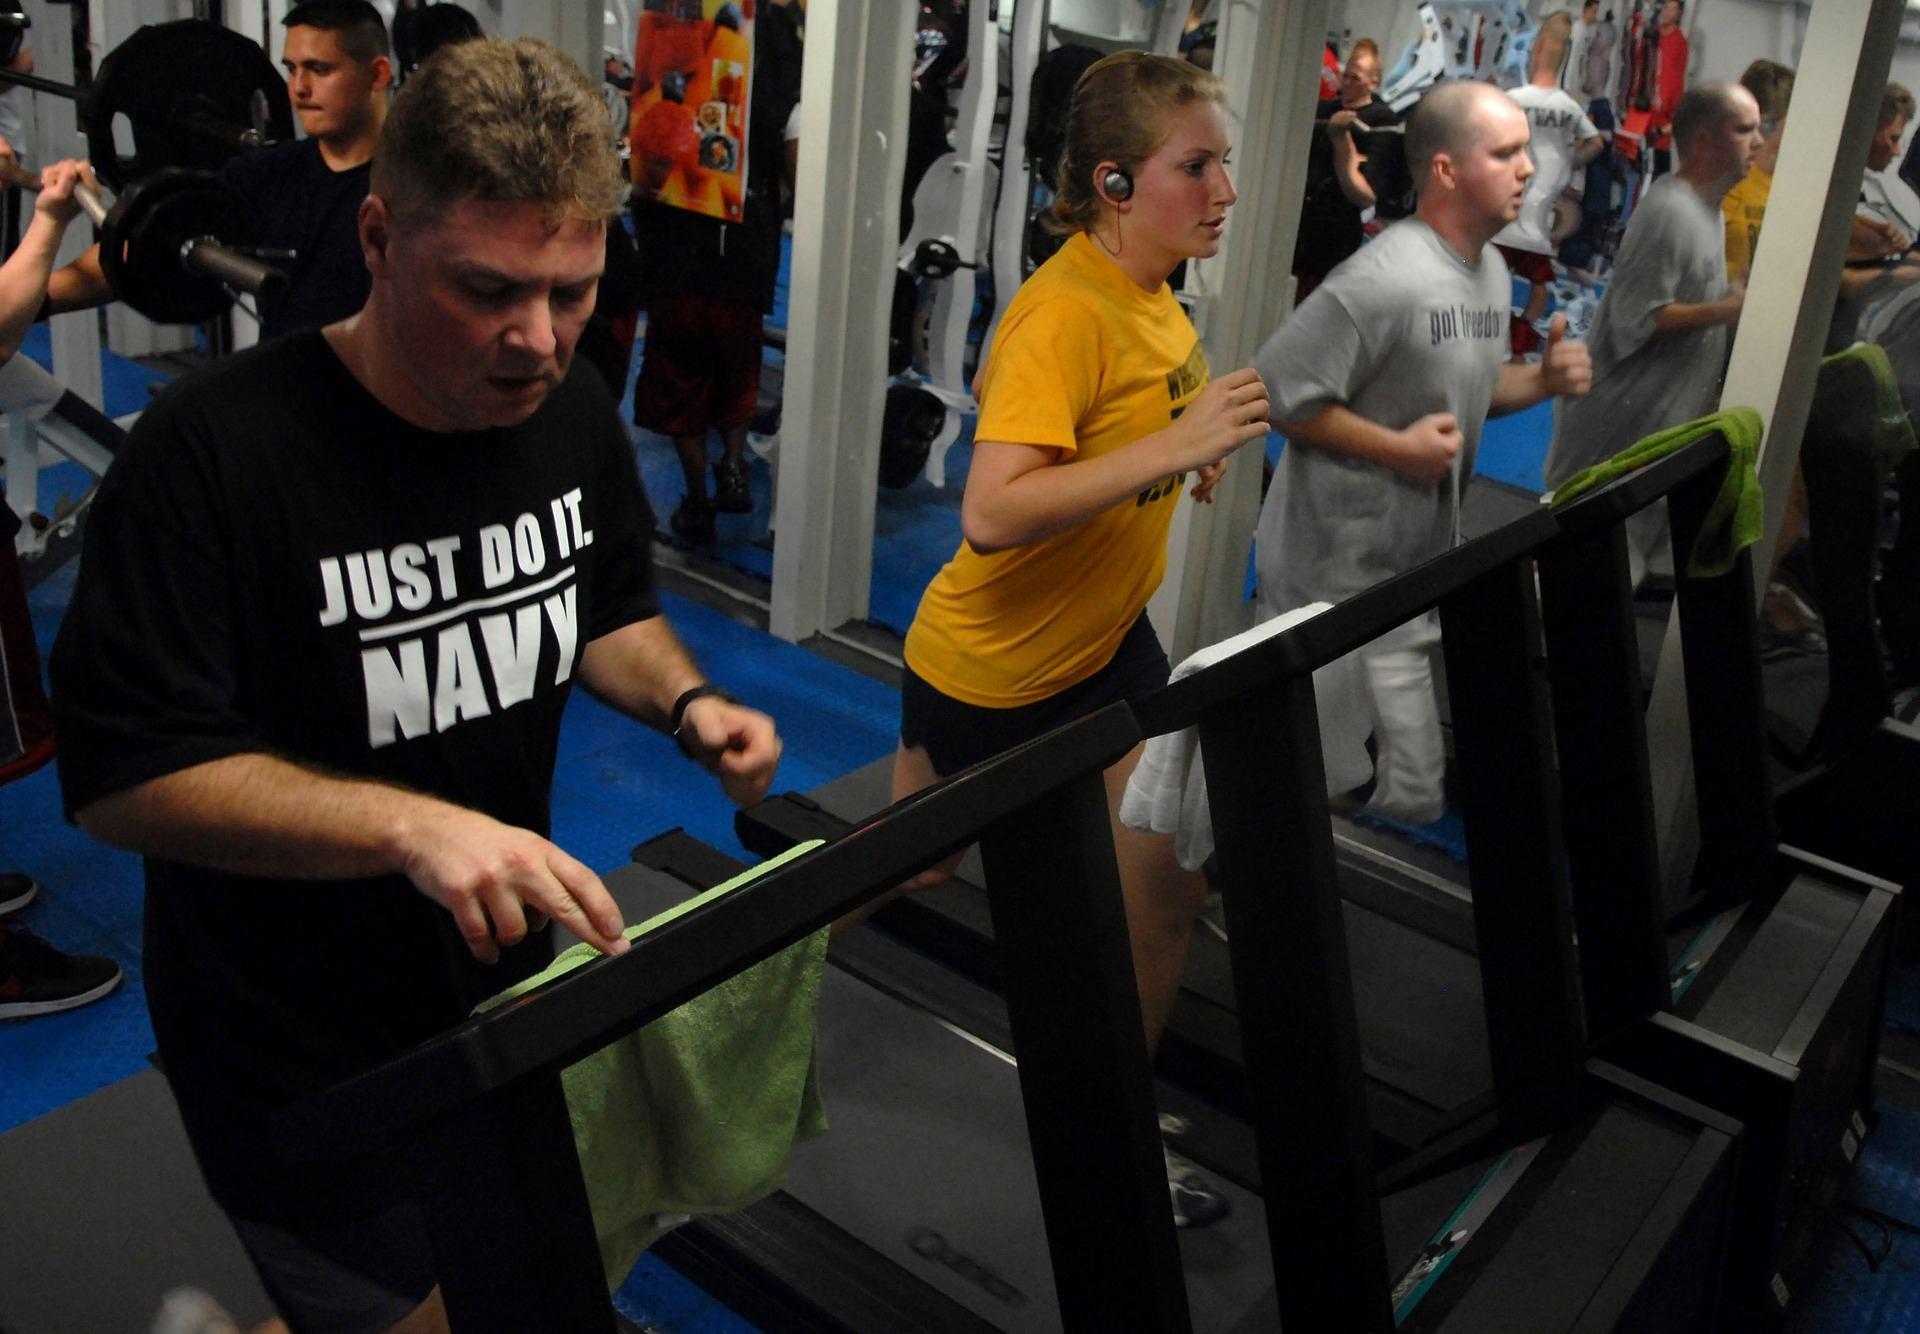 gym-room-1181815_1920